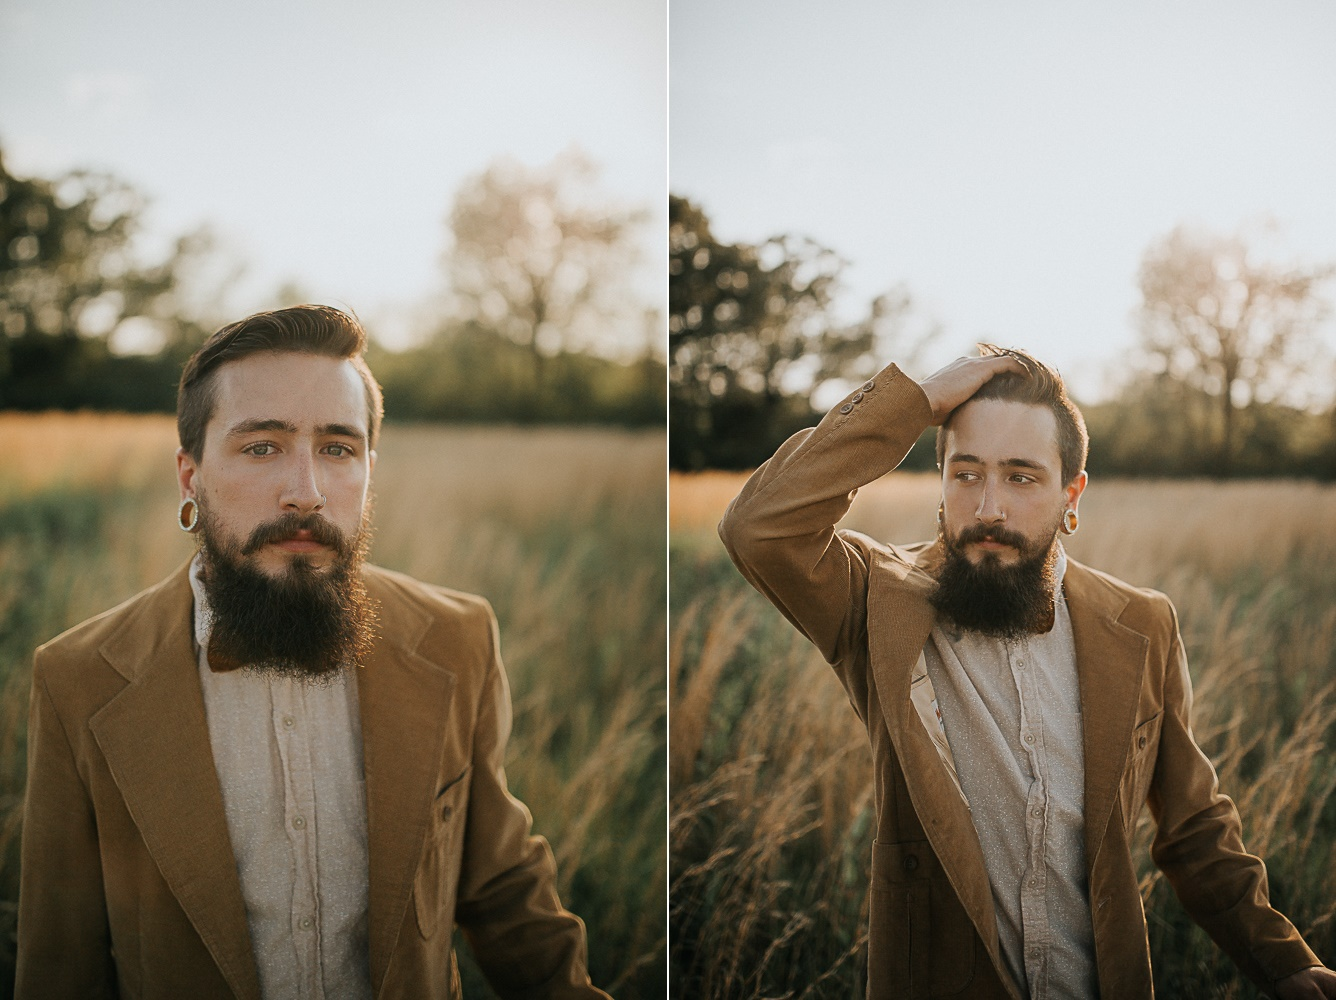 Cassie Cook Photography-Memphis TN-portrait and wedding photographer -6943-horz.jpg